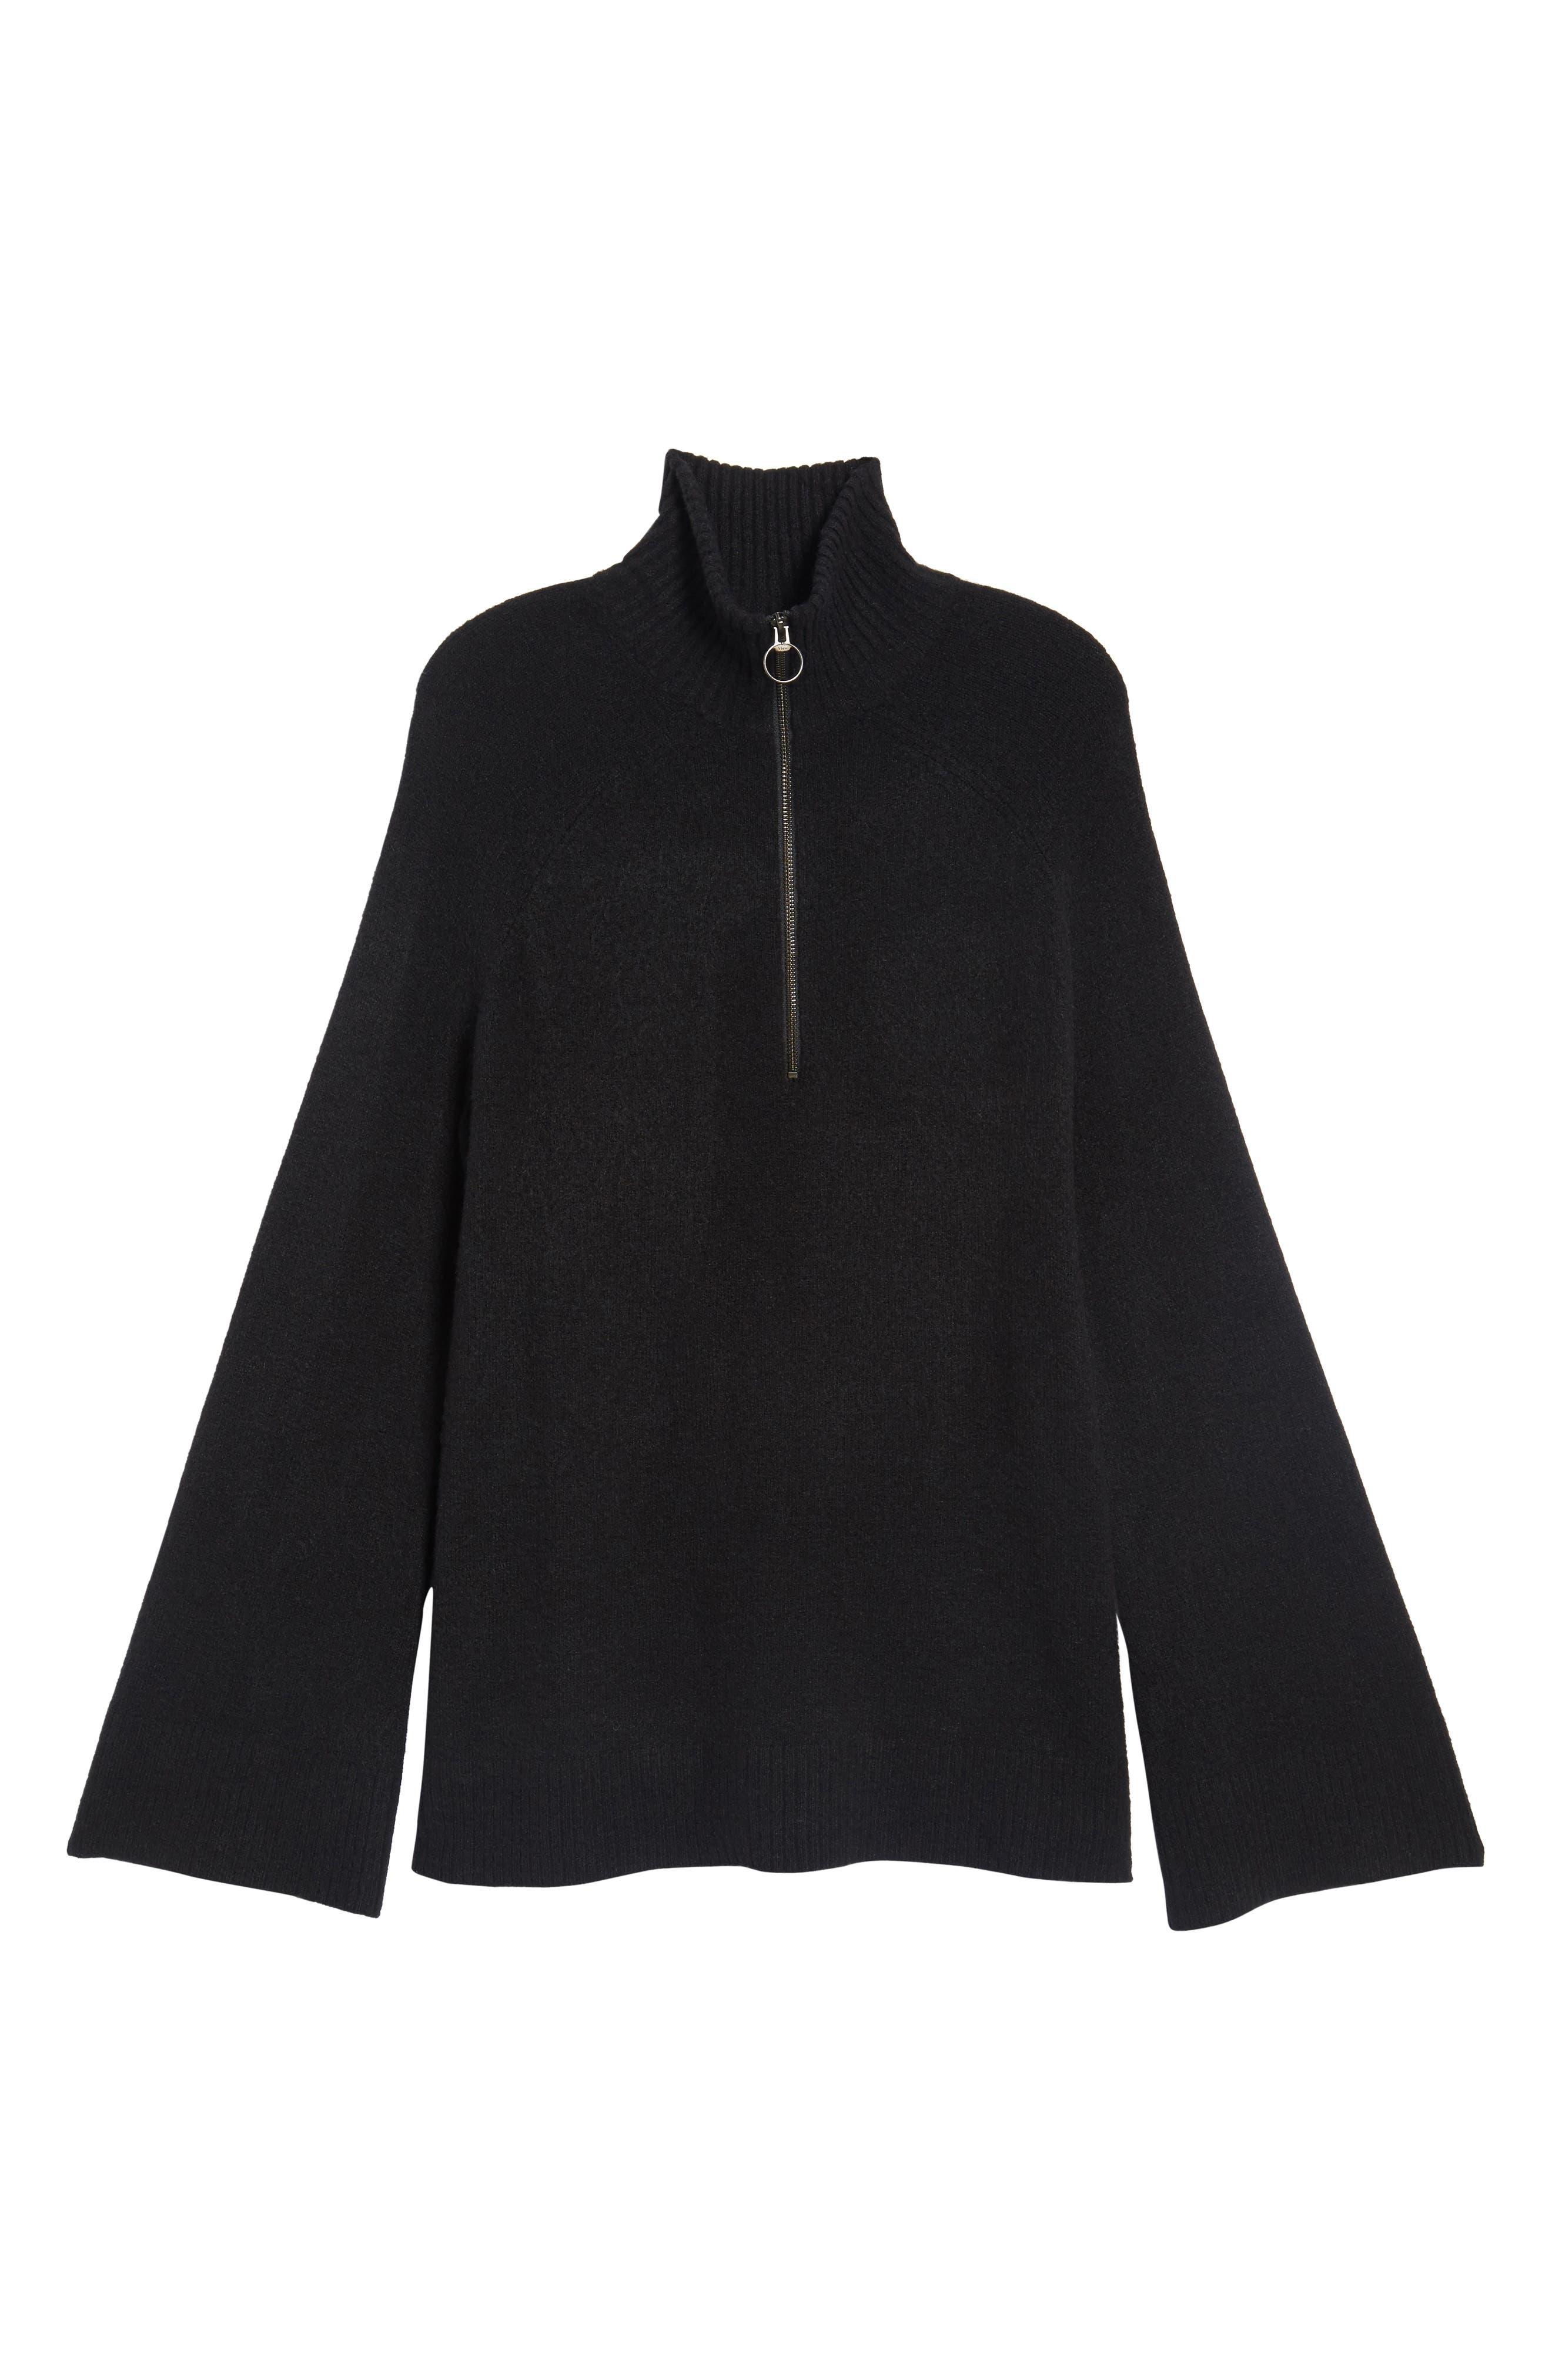 Half Zip Pullover,                             Alternate thumbnail 6, color,                             001